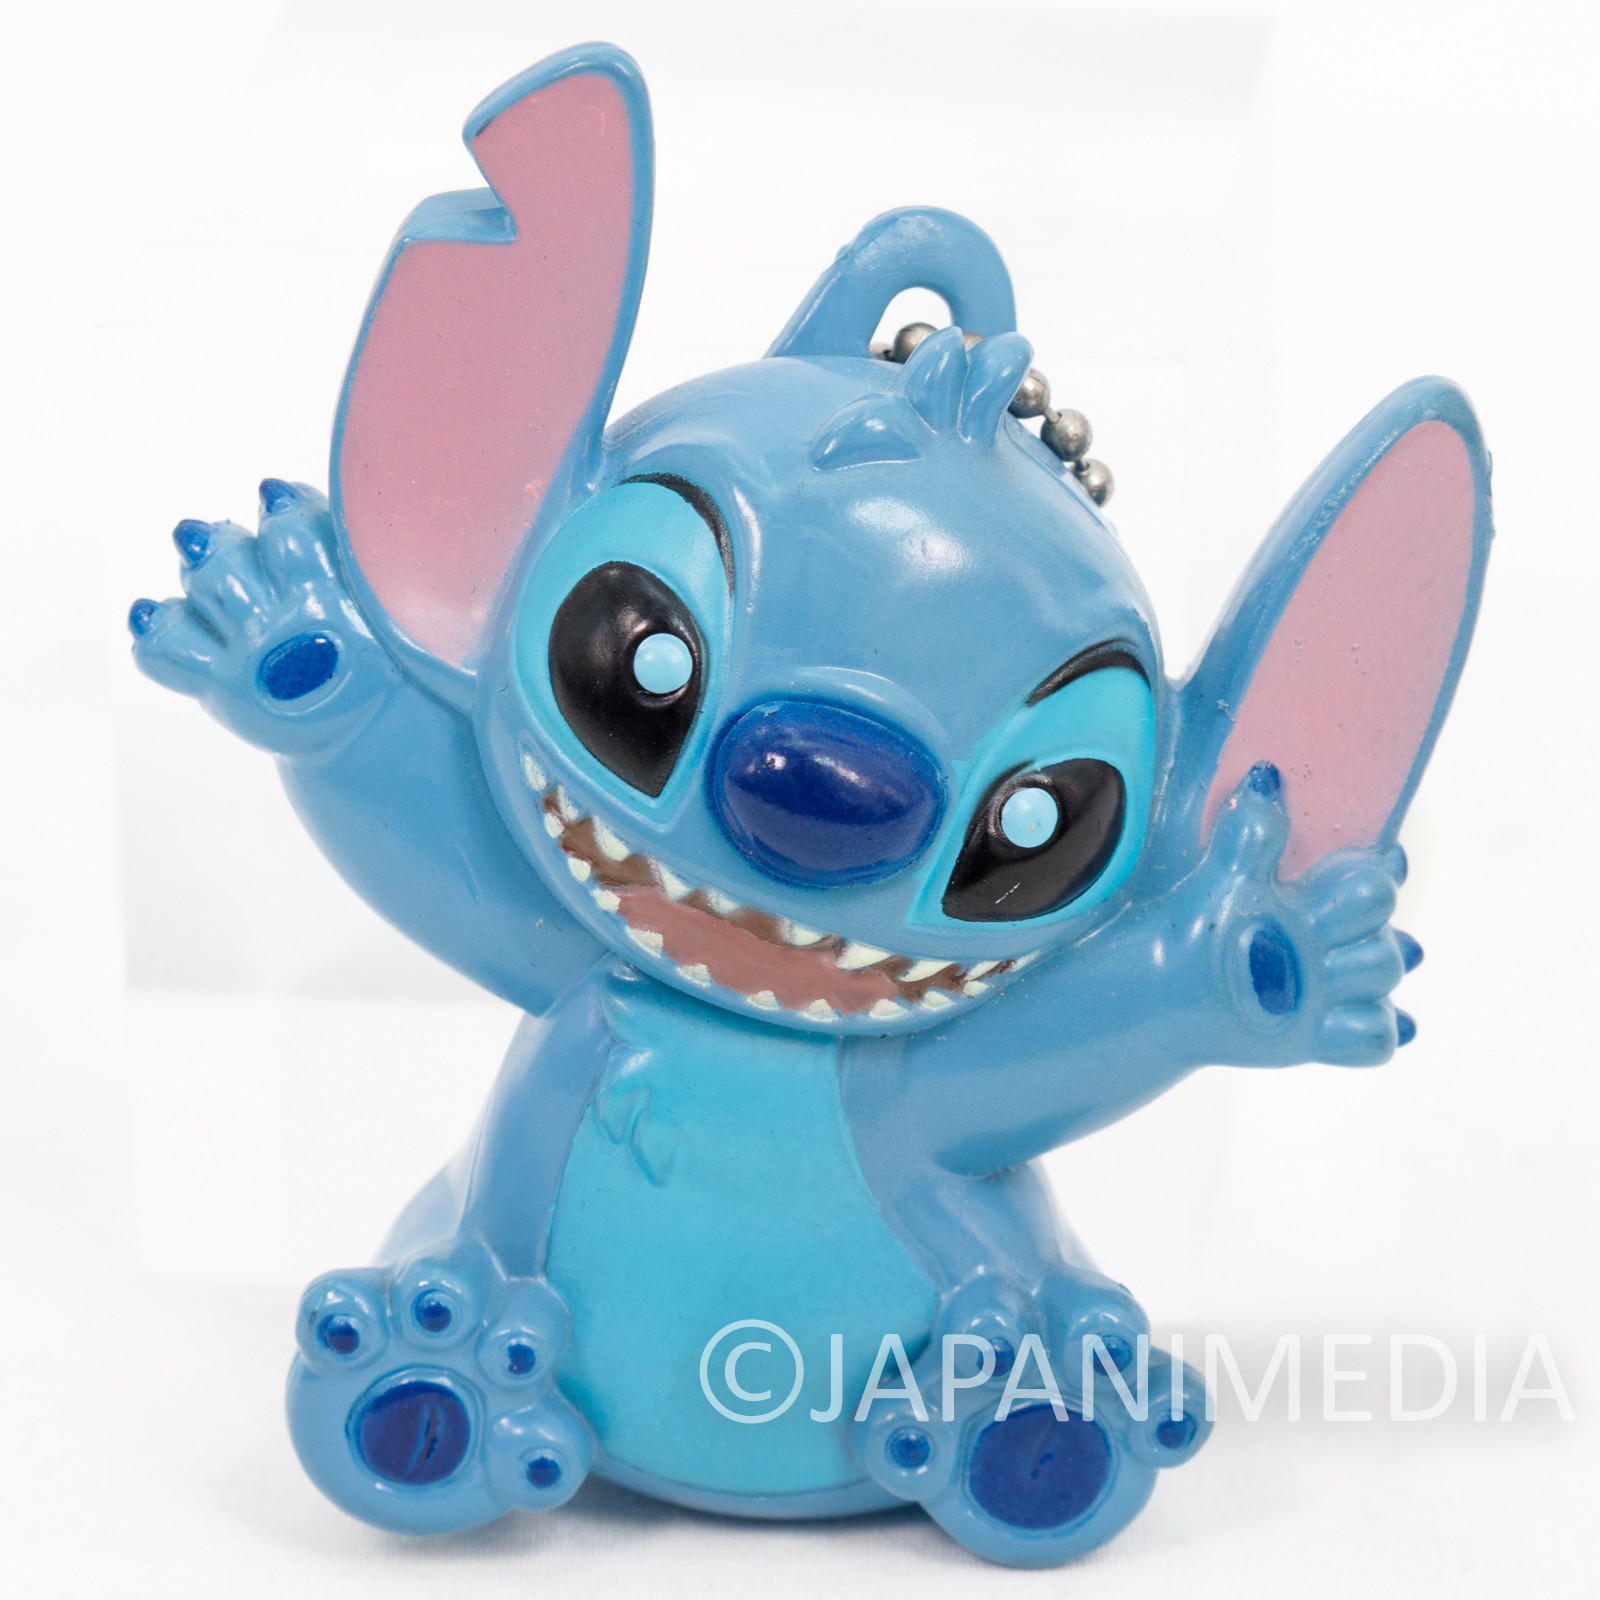 Disney Stitch Mascot Figure Light Pins Ballchain JAPAN ANIME